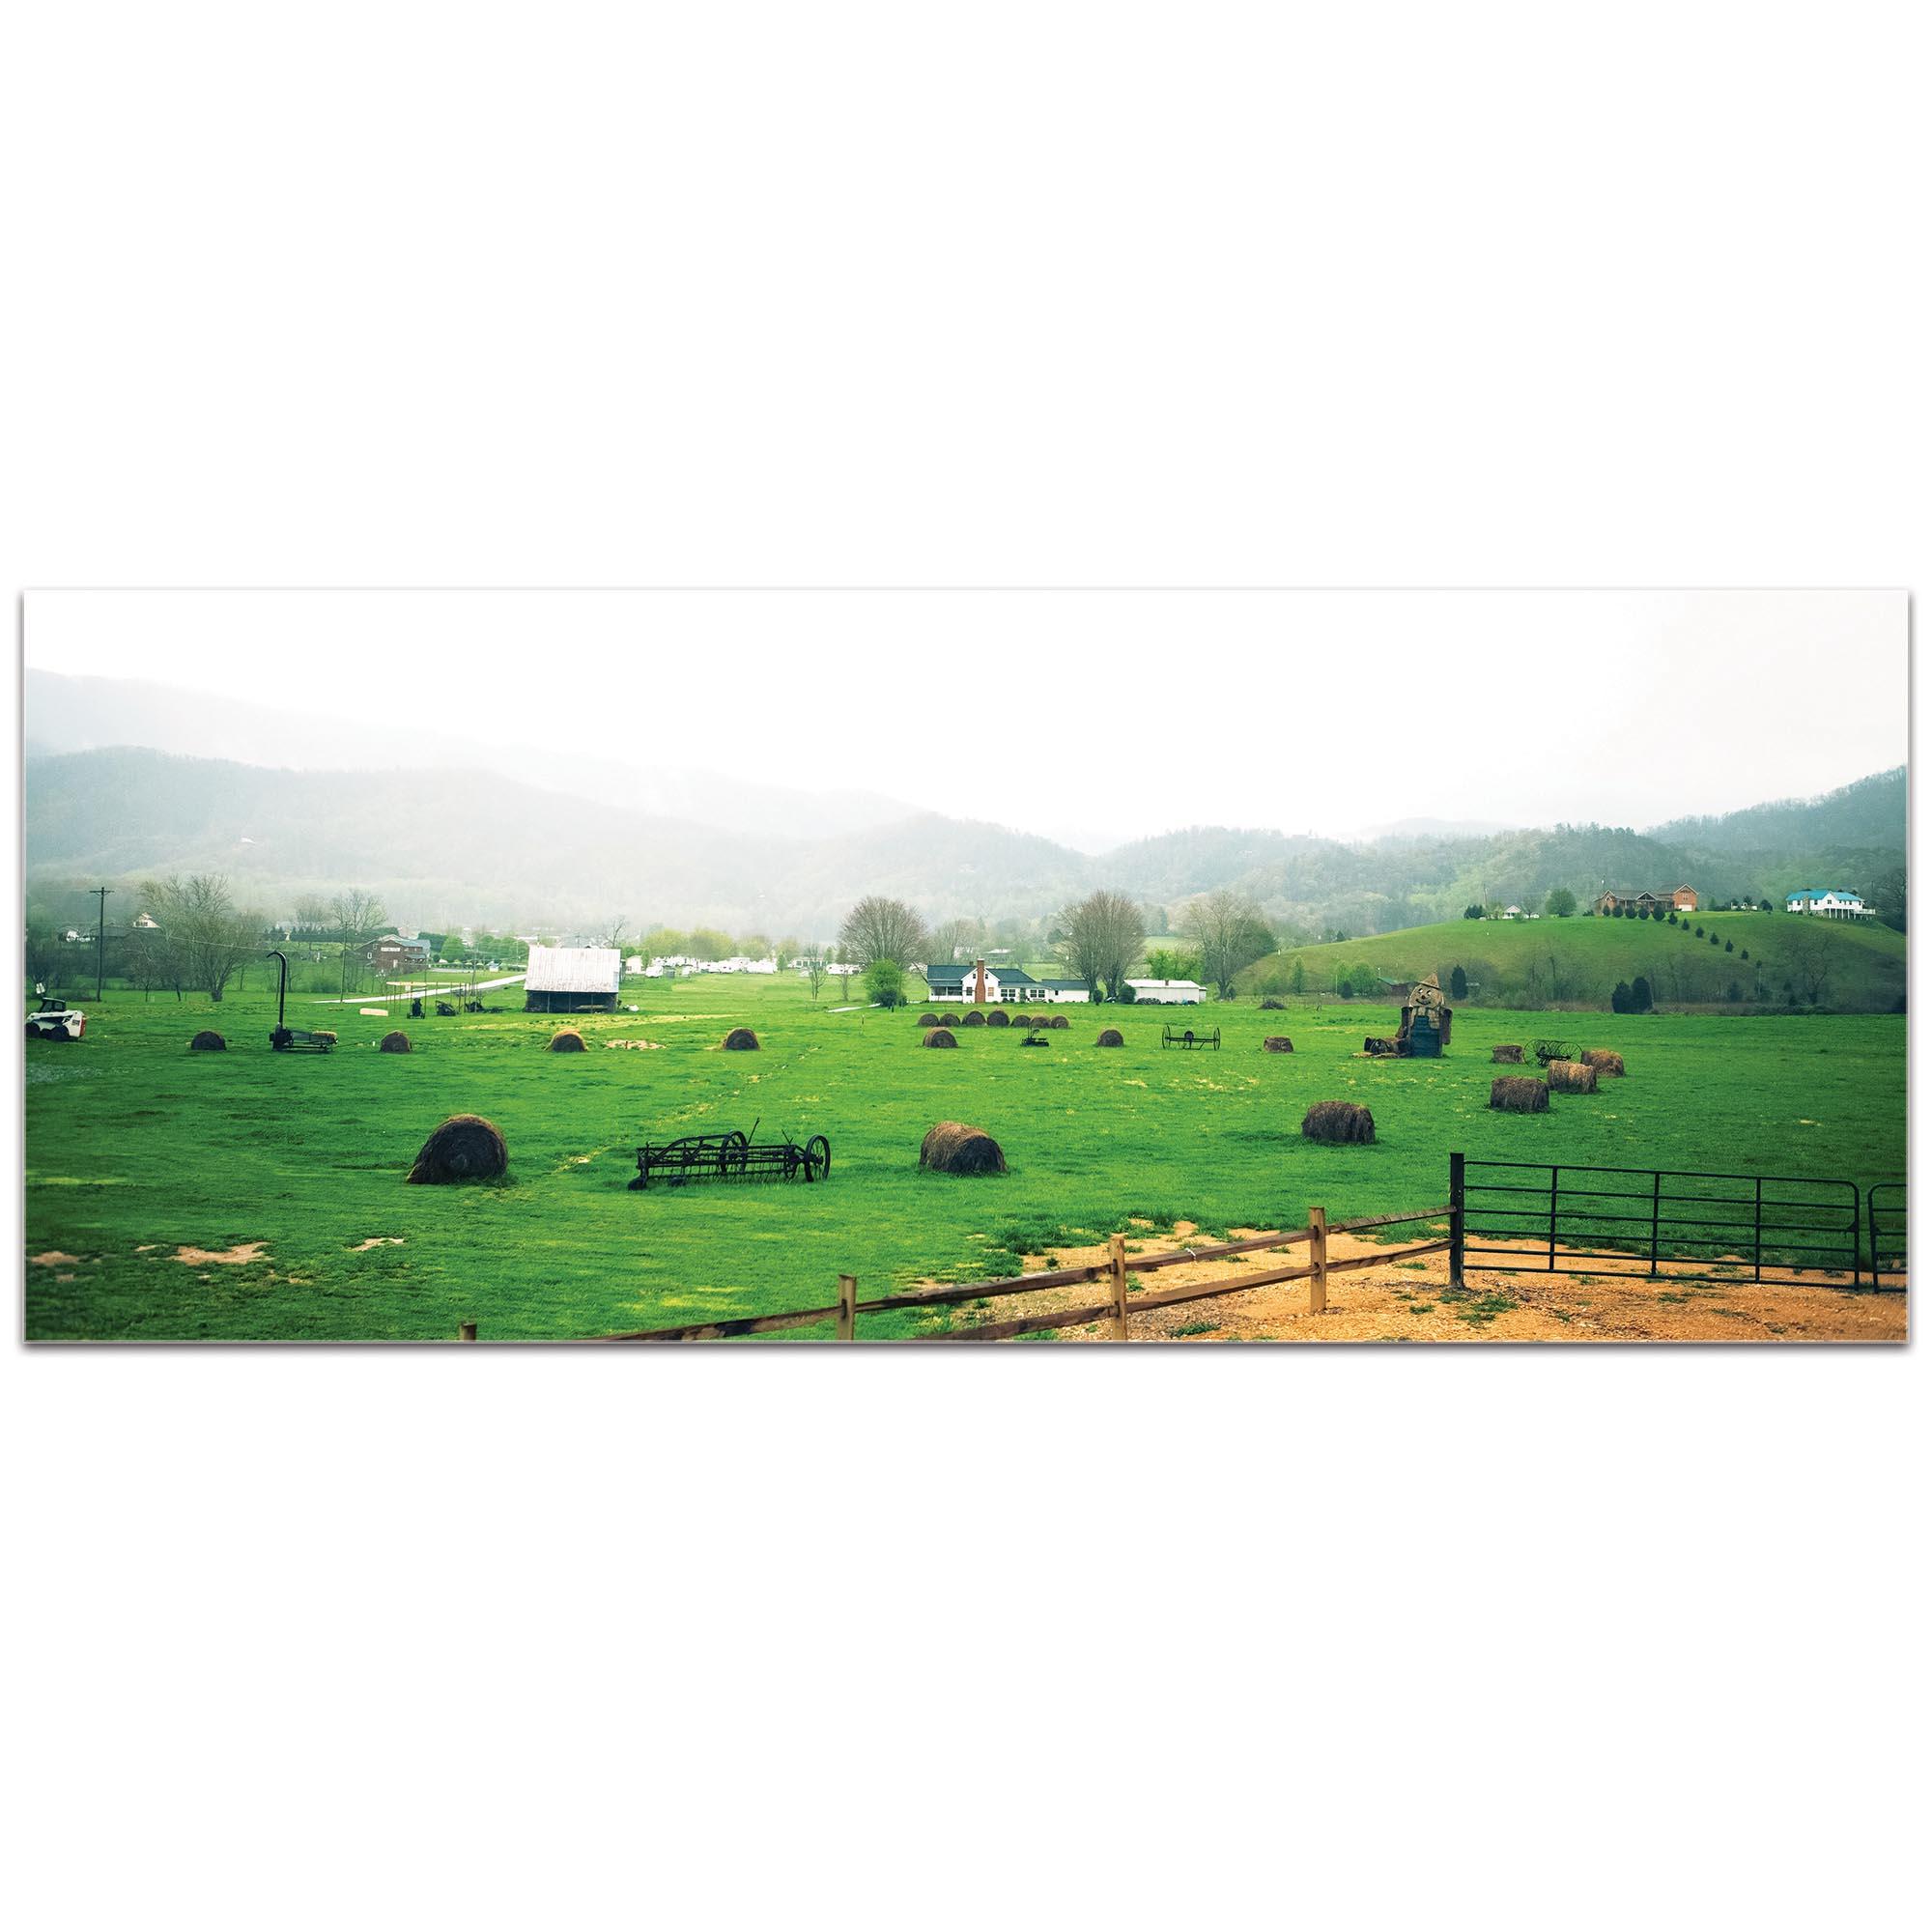 Western Wall Art 'Farming Town' - Farm Landscape Decor on Metal or Plexiglass - Image 2